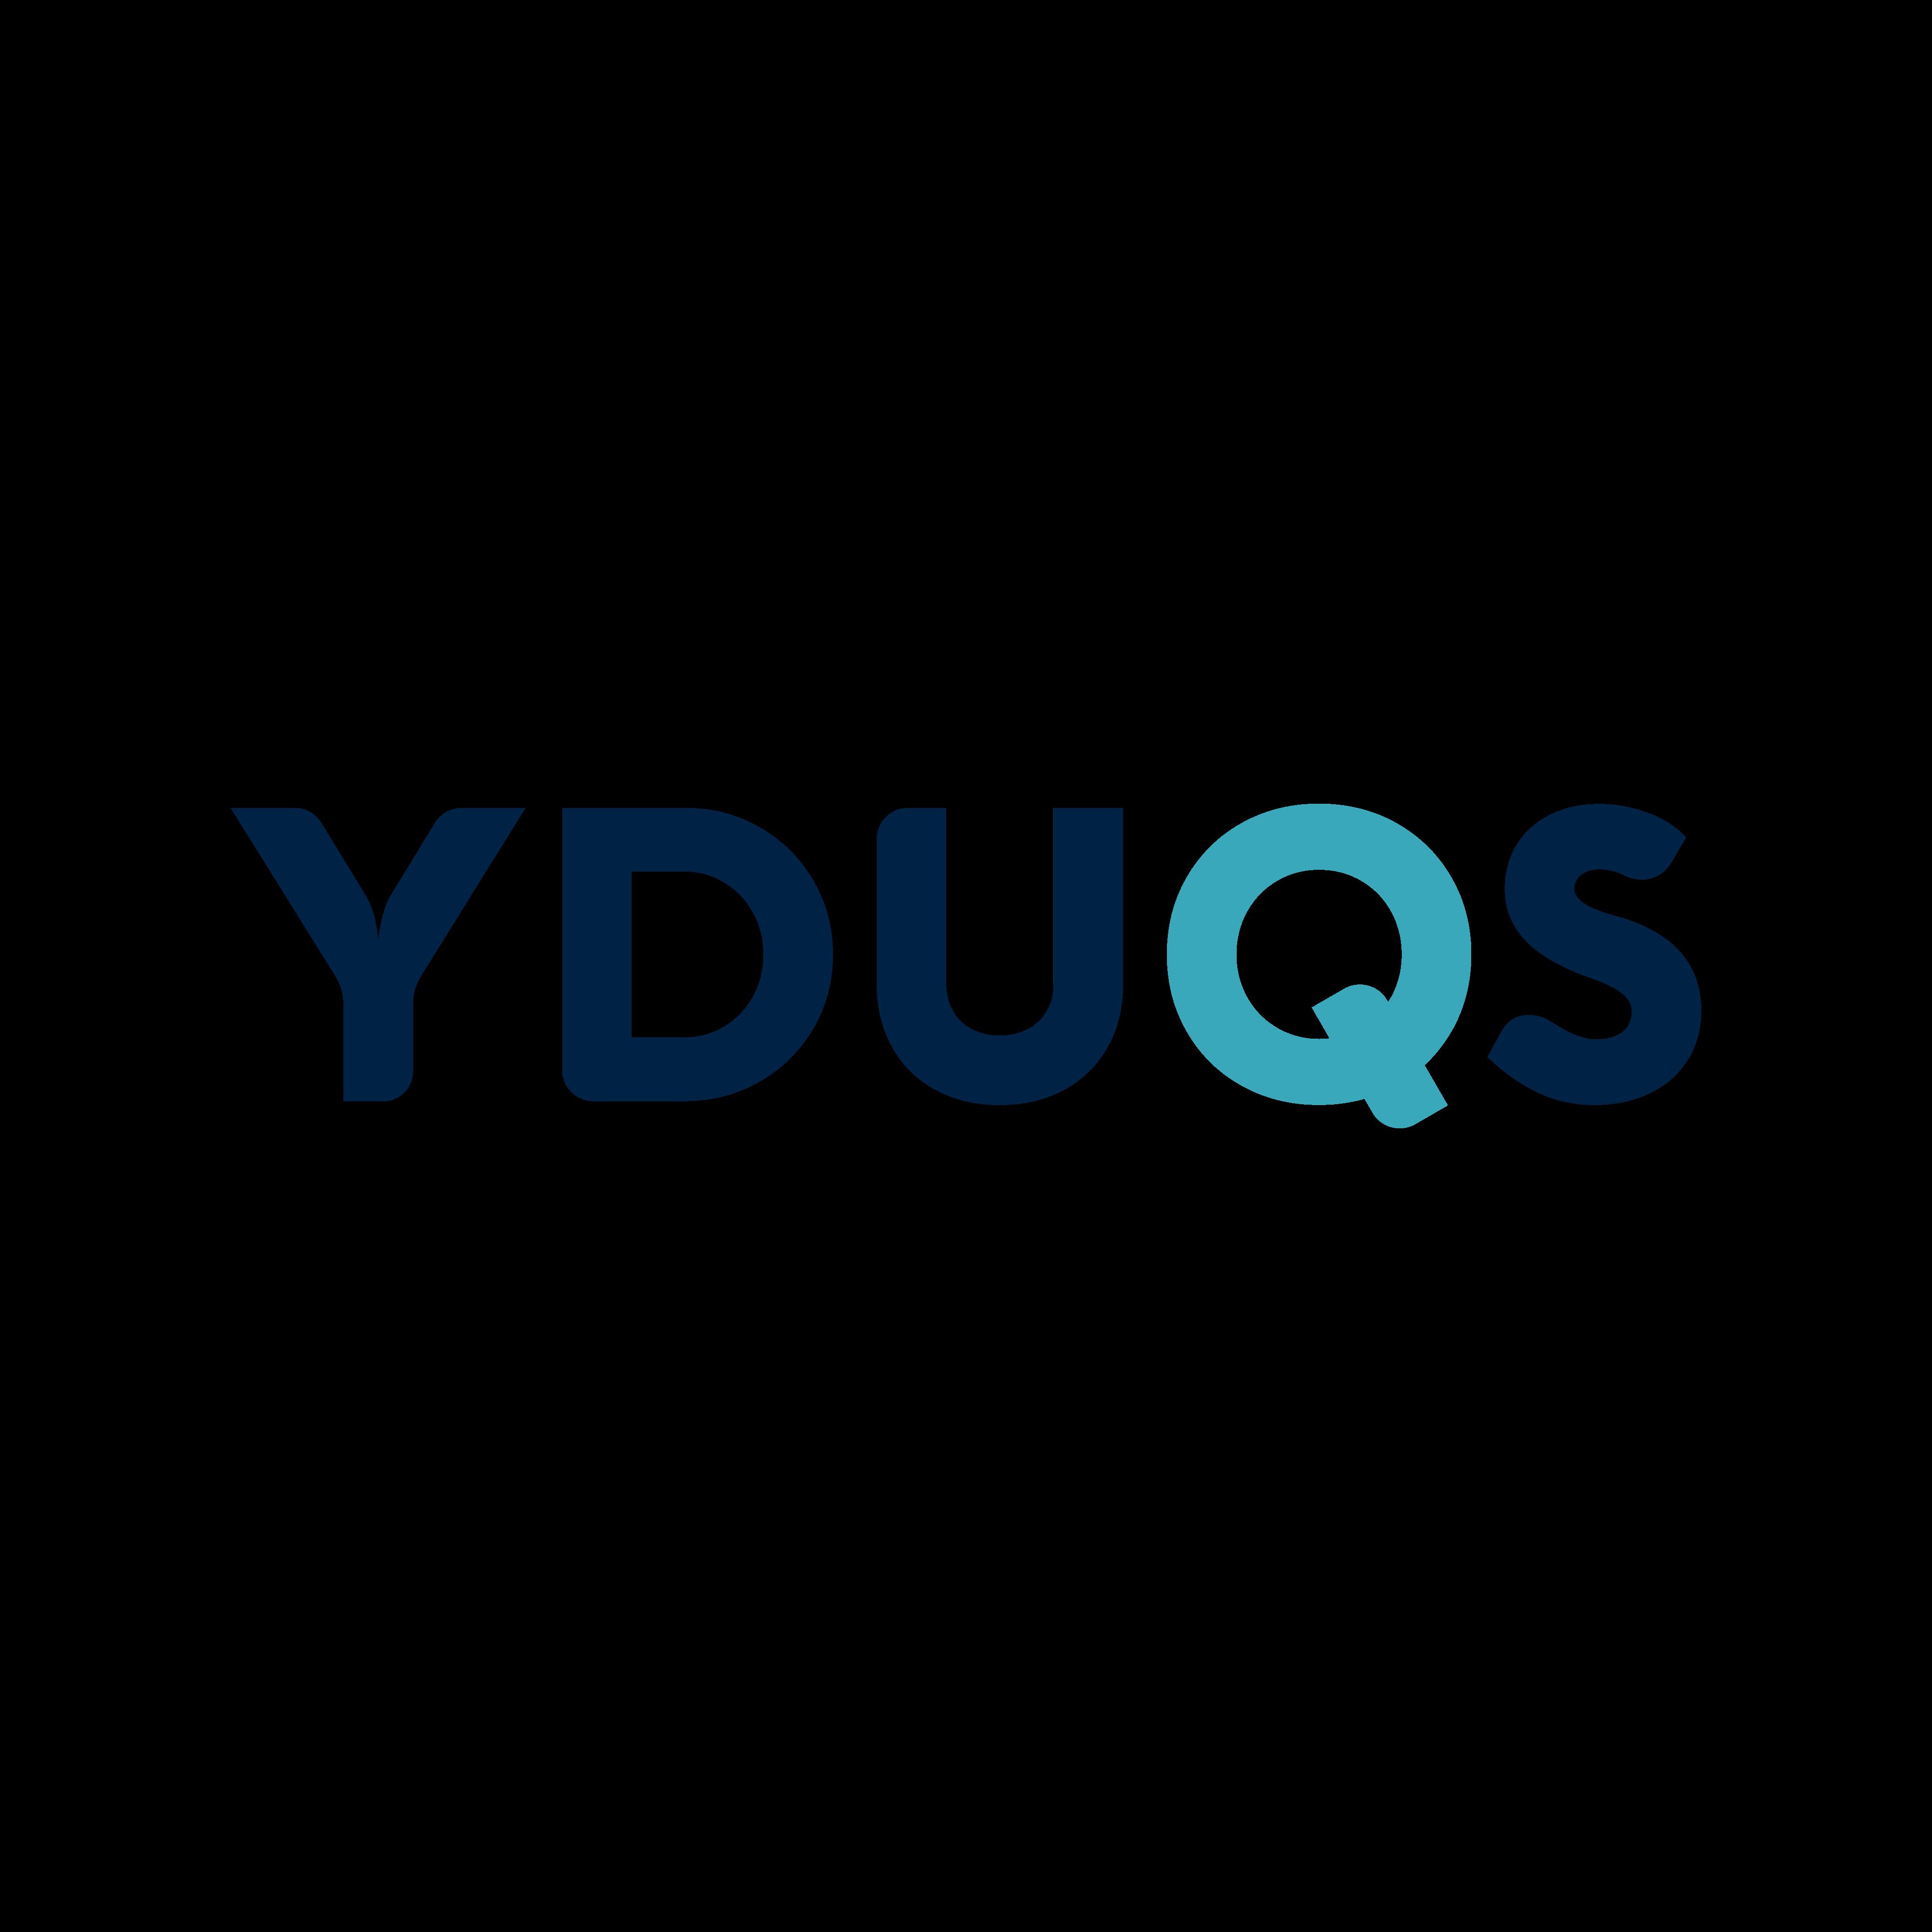 yduqs logo 0 - YDUQS Logo